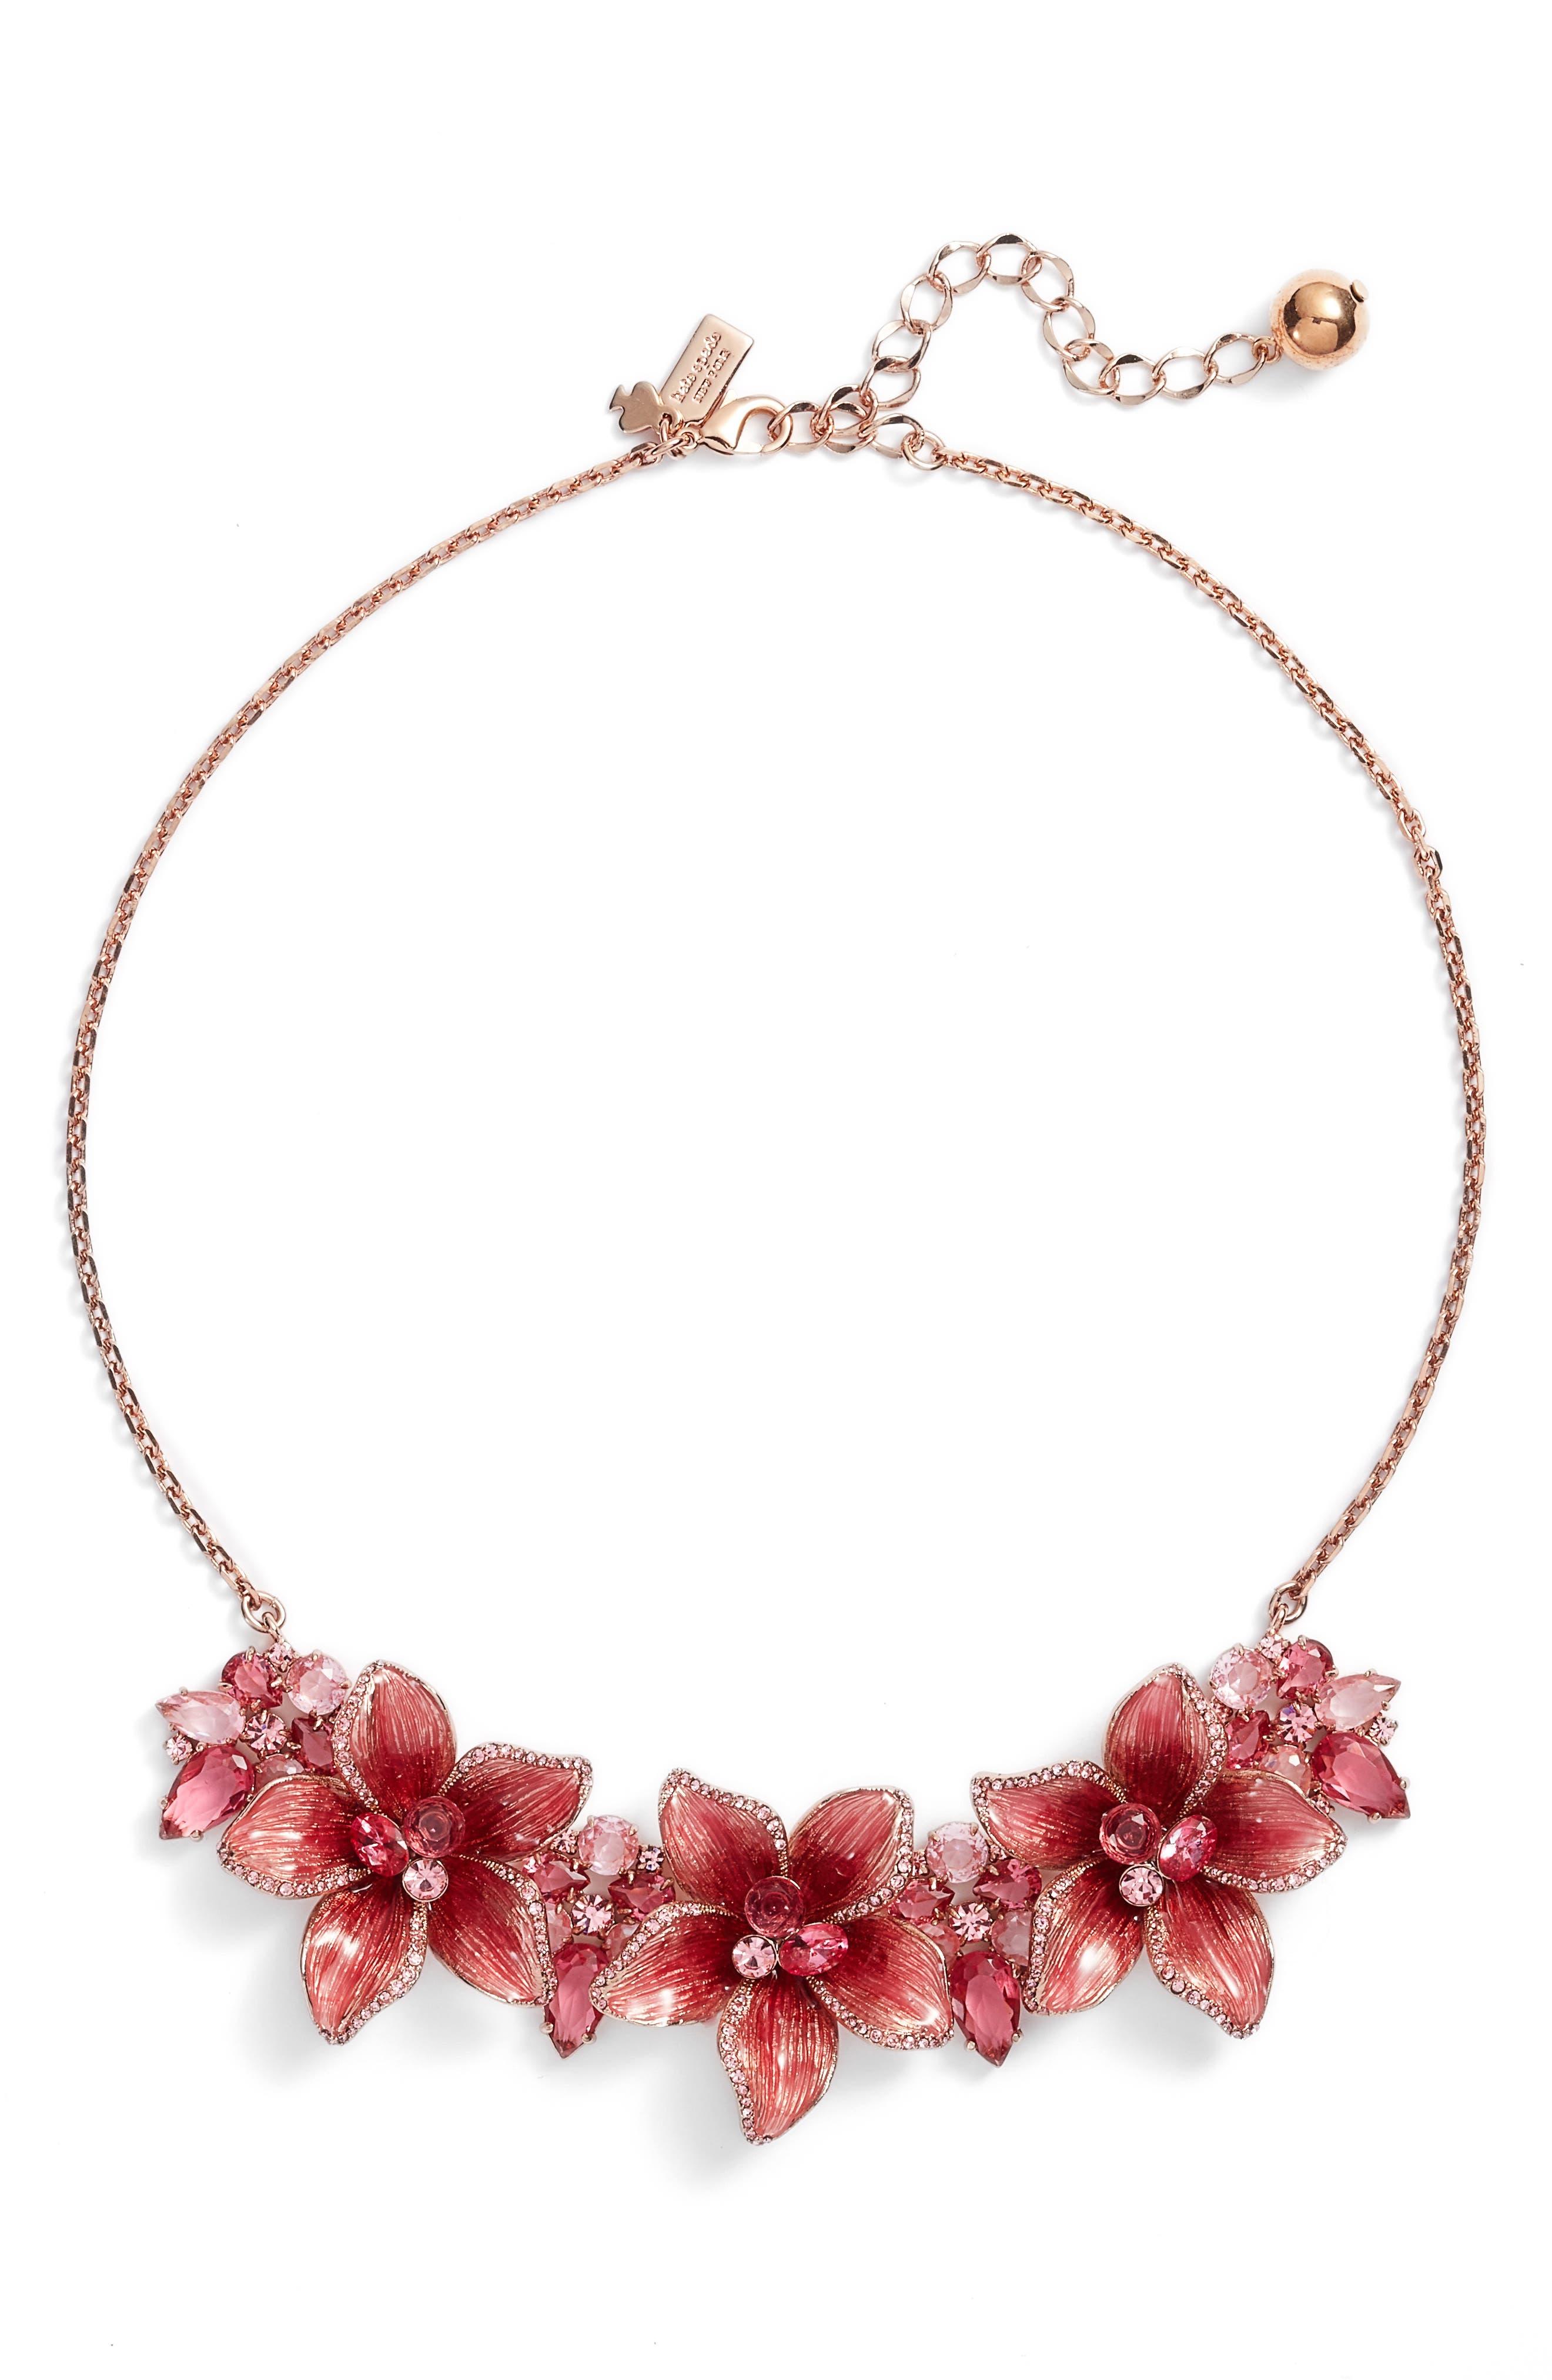 Main Image - kate spade new york winter garden statement necklace